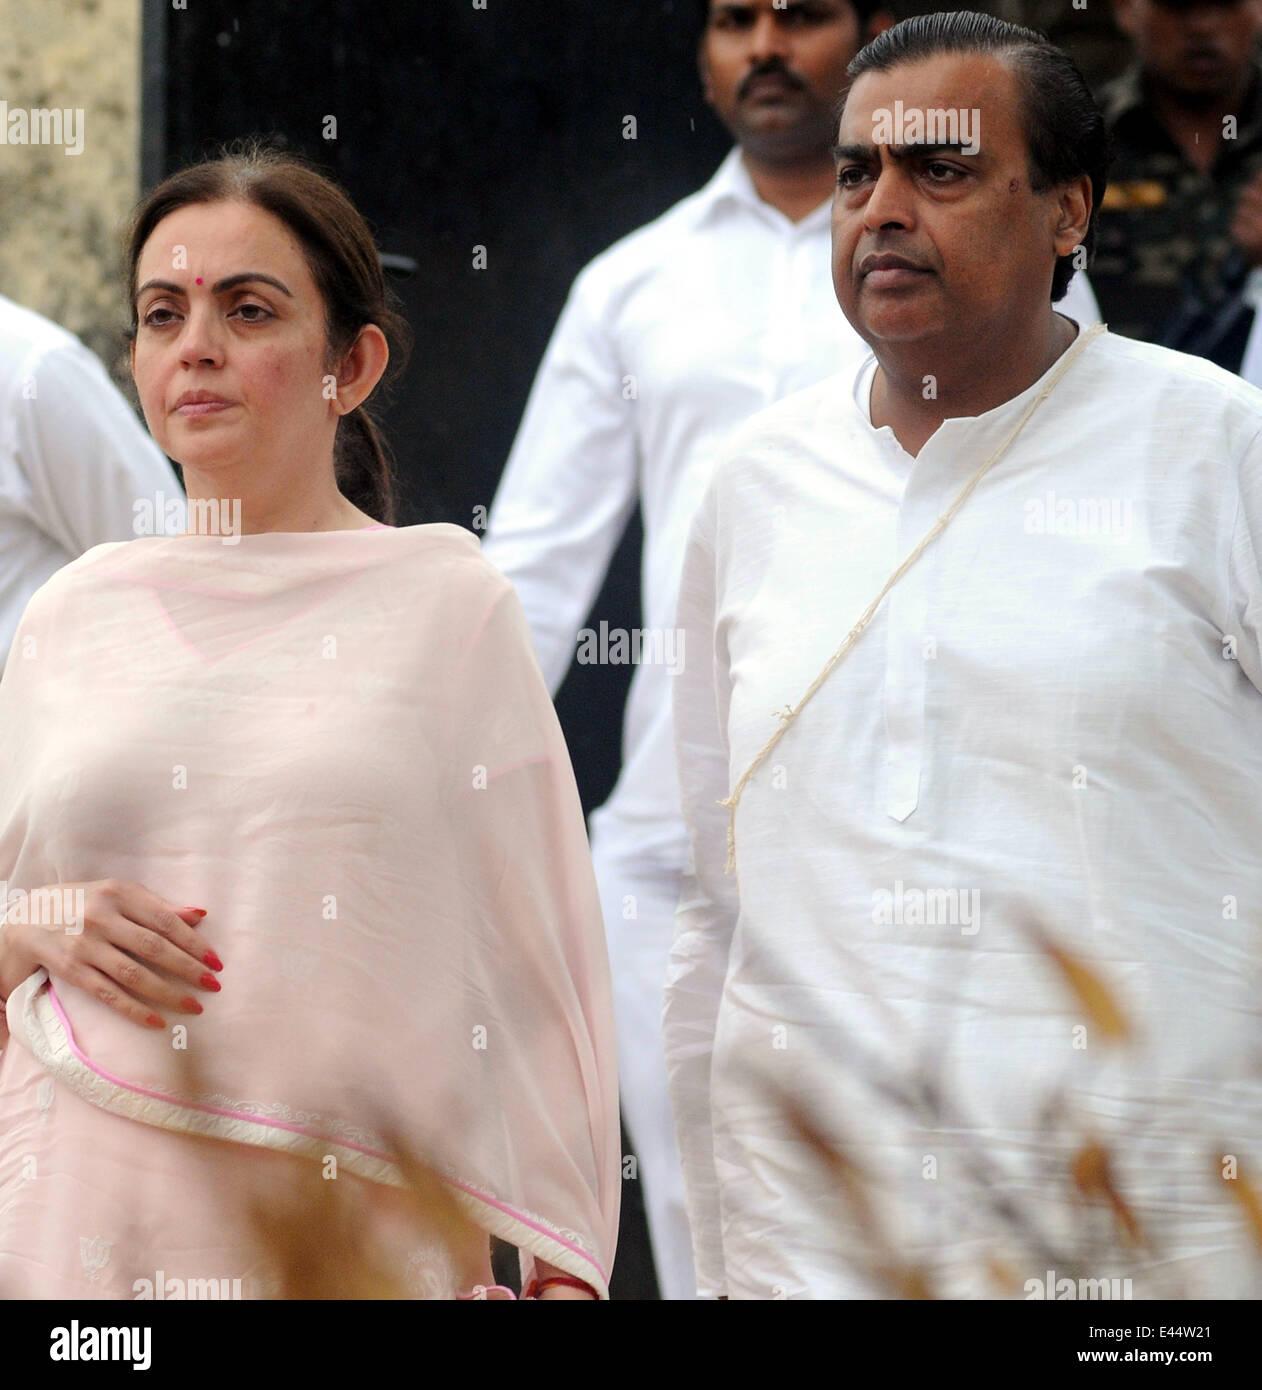 Mumbai, India. 2nd July, 2014. Indian business tycoon Mukesh Ambani (R) and his wife Nita Ambani arrive at the funeral - Stock Image